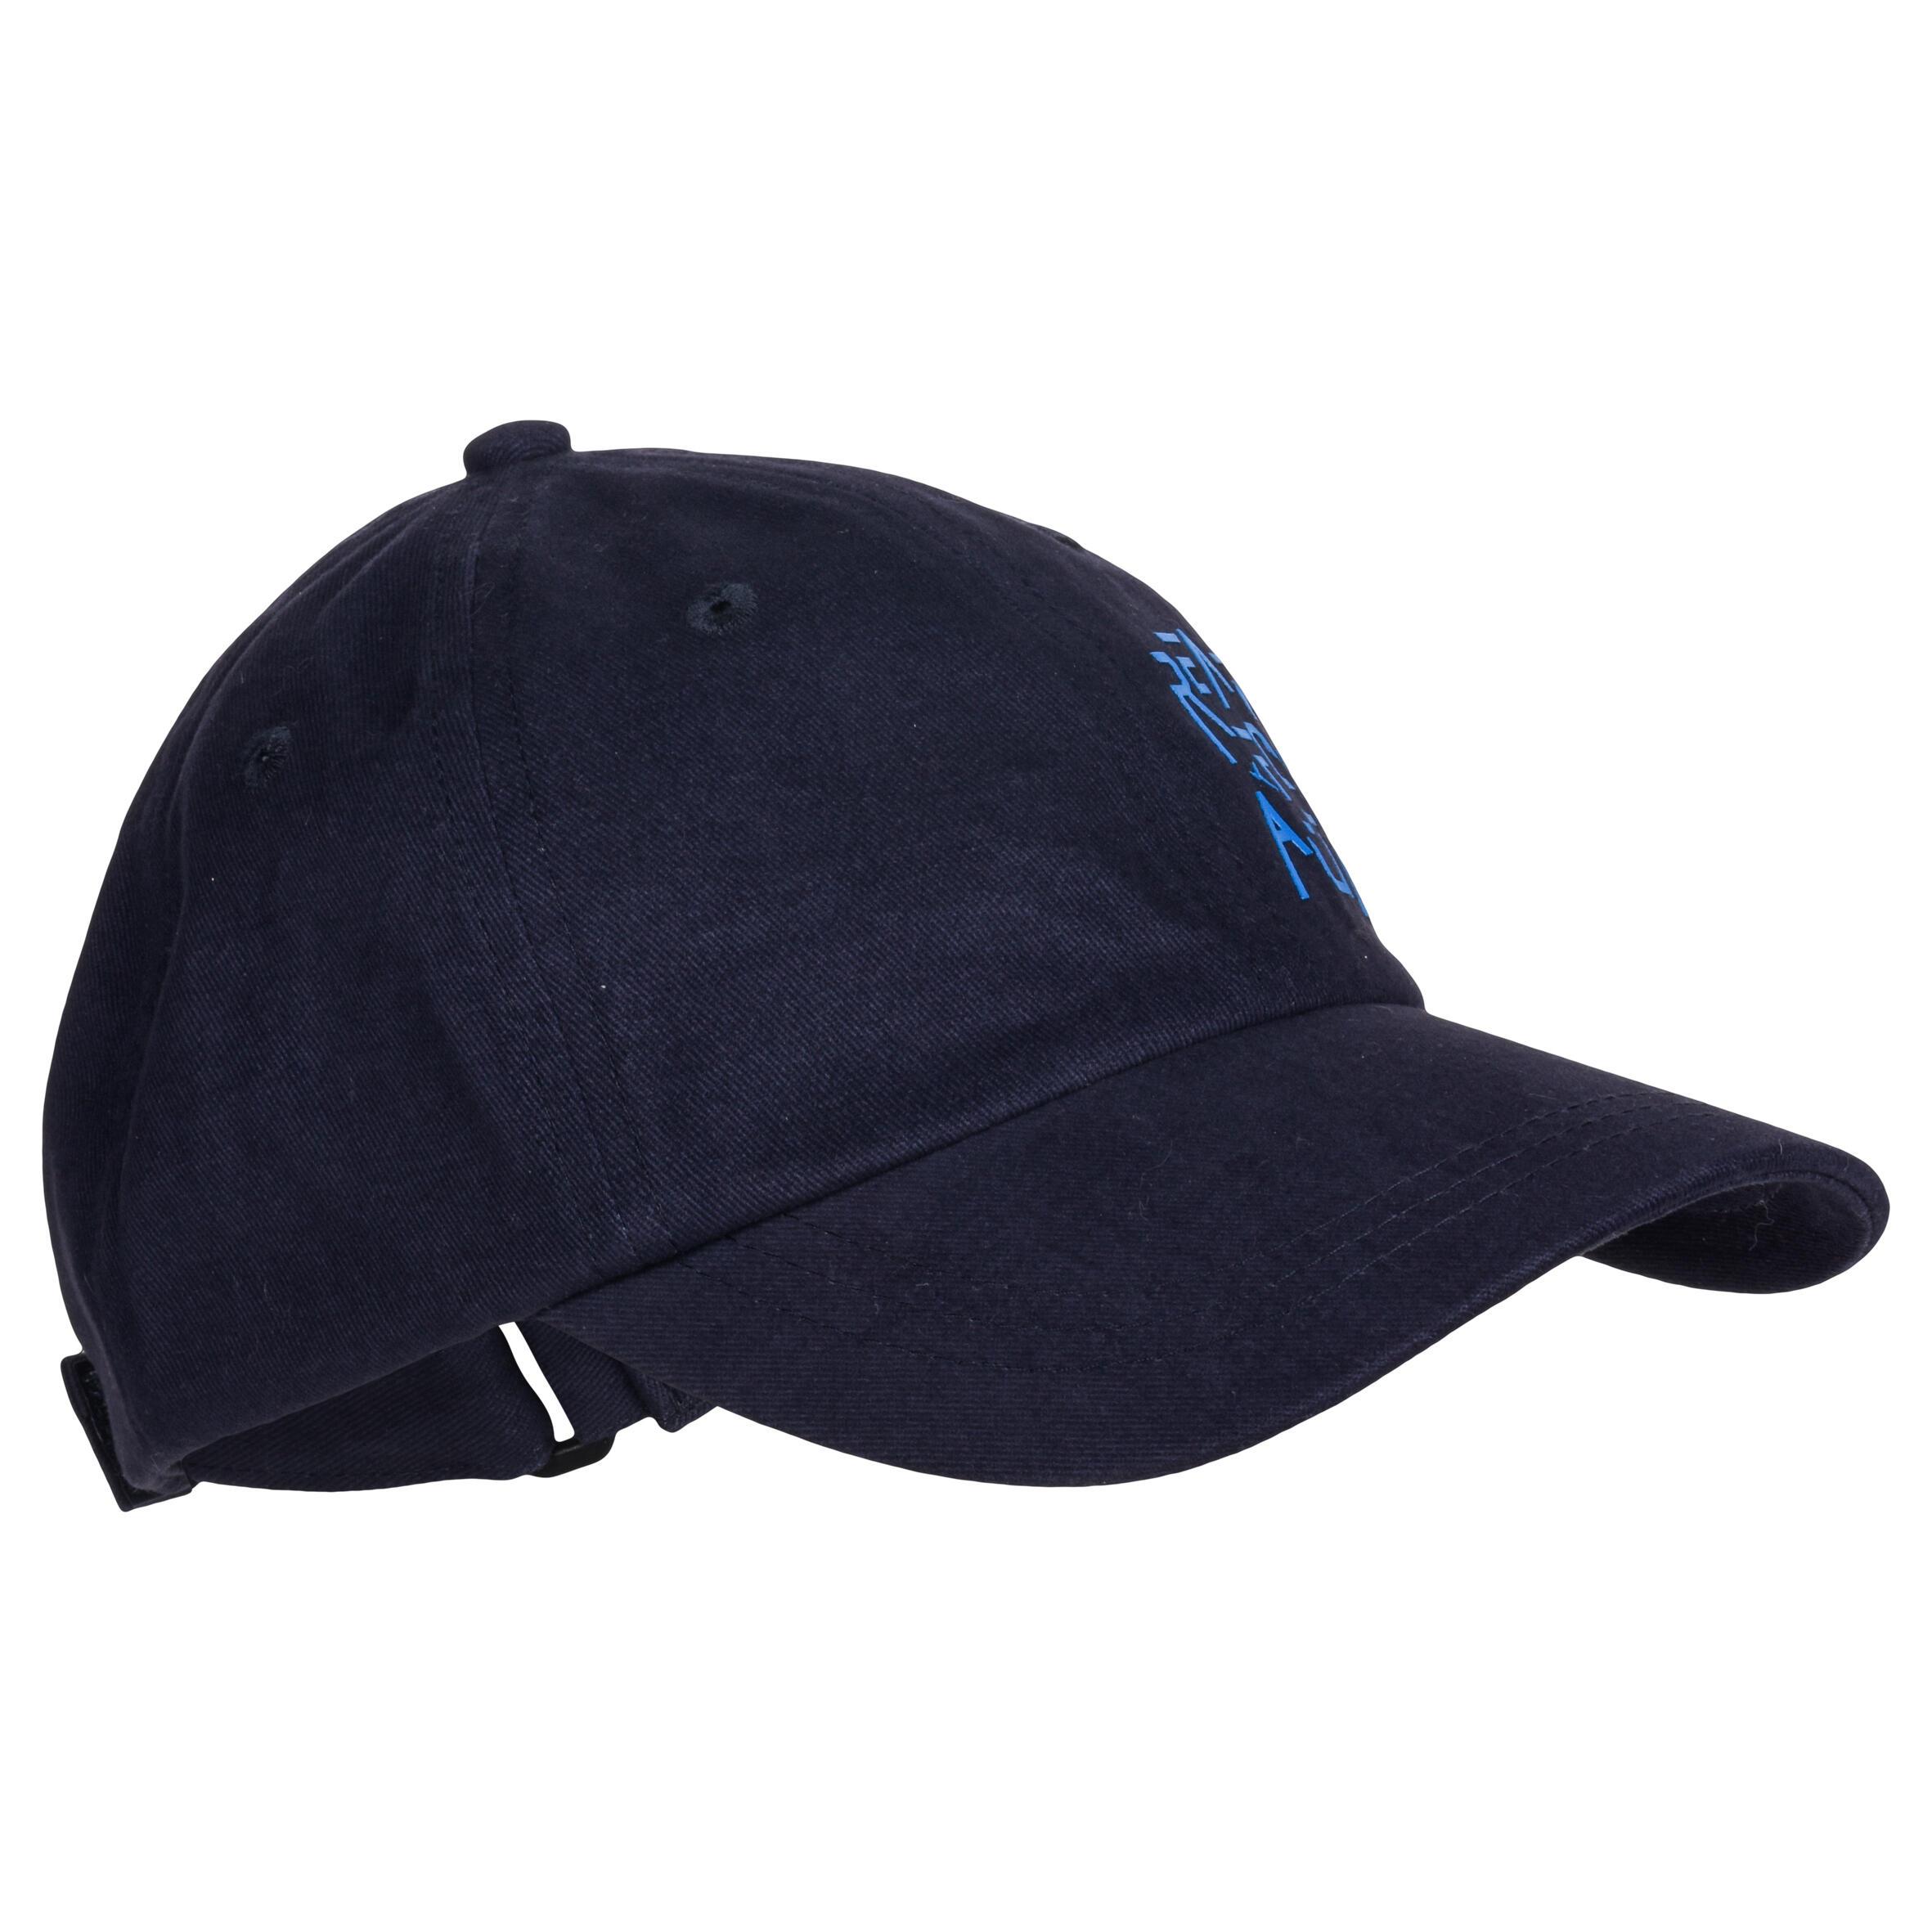 500 Boys' Gym Cap - Blue Print